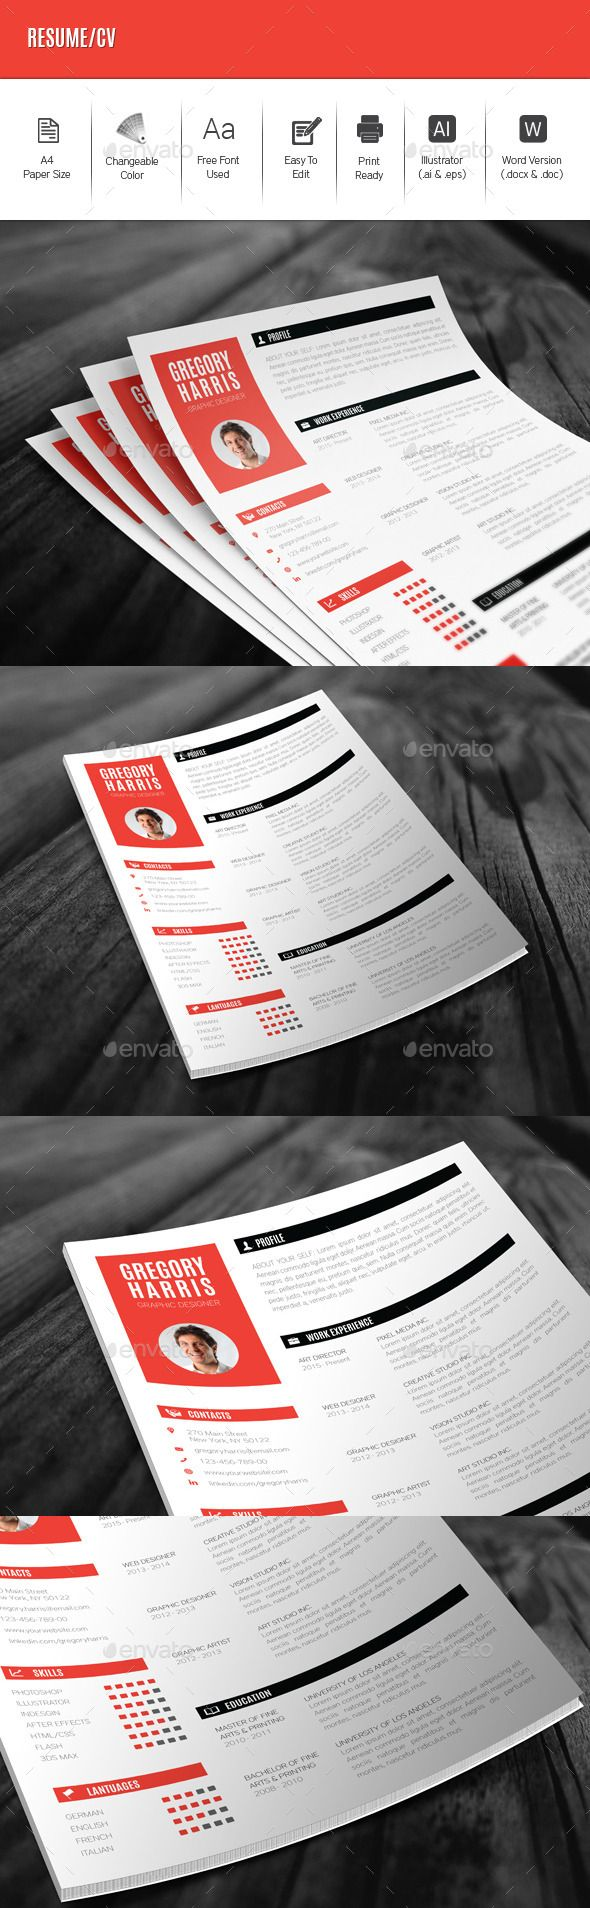 #Resume/CV - Resumes Stationery Download Here: https://graphicriver.net/item/resumecv/12513121?ref=suz_562geid